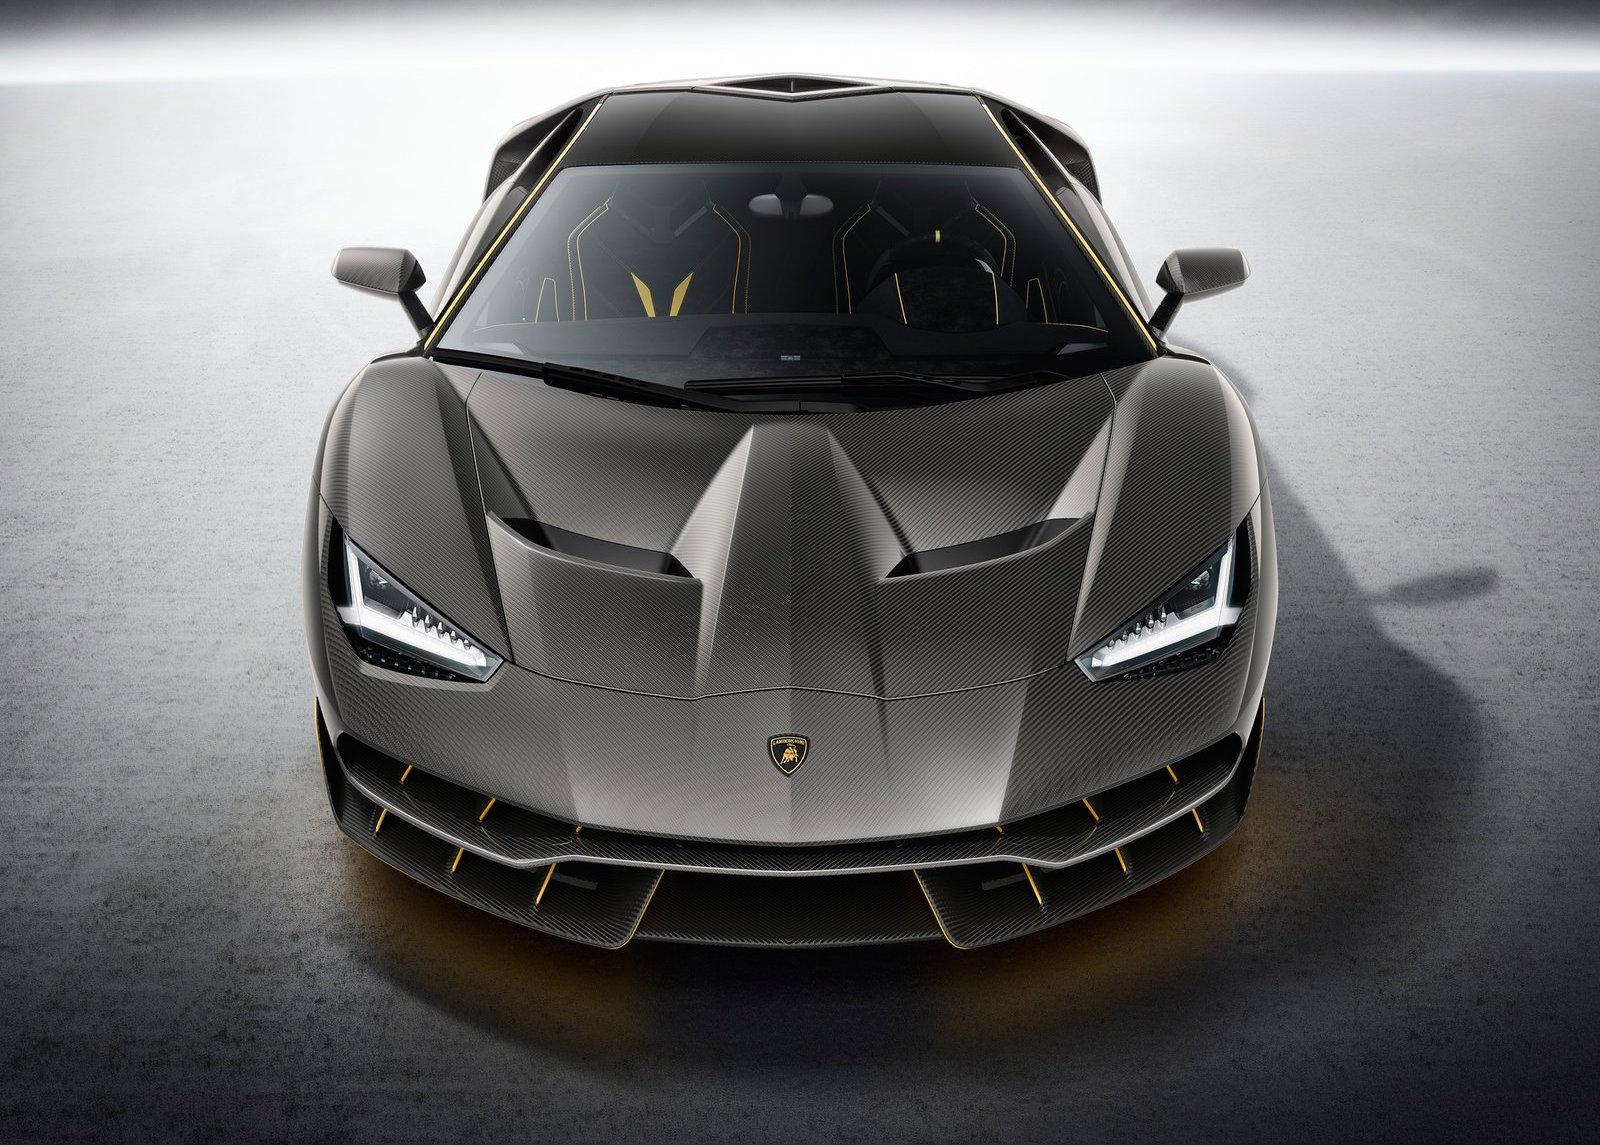 2017 Lamborghini Centenario: 566kW V12 centenary limited ...